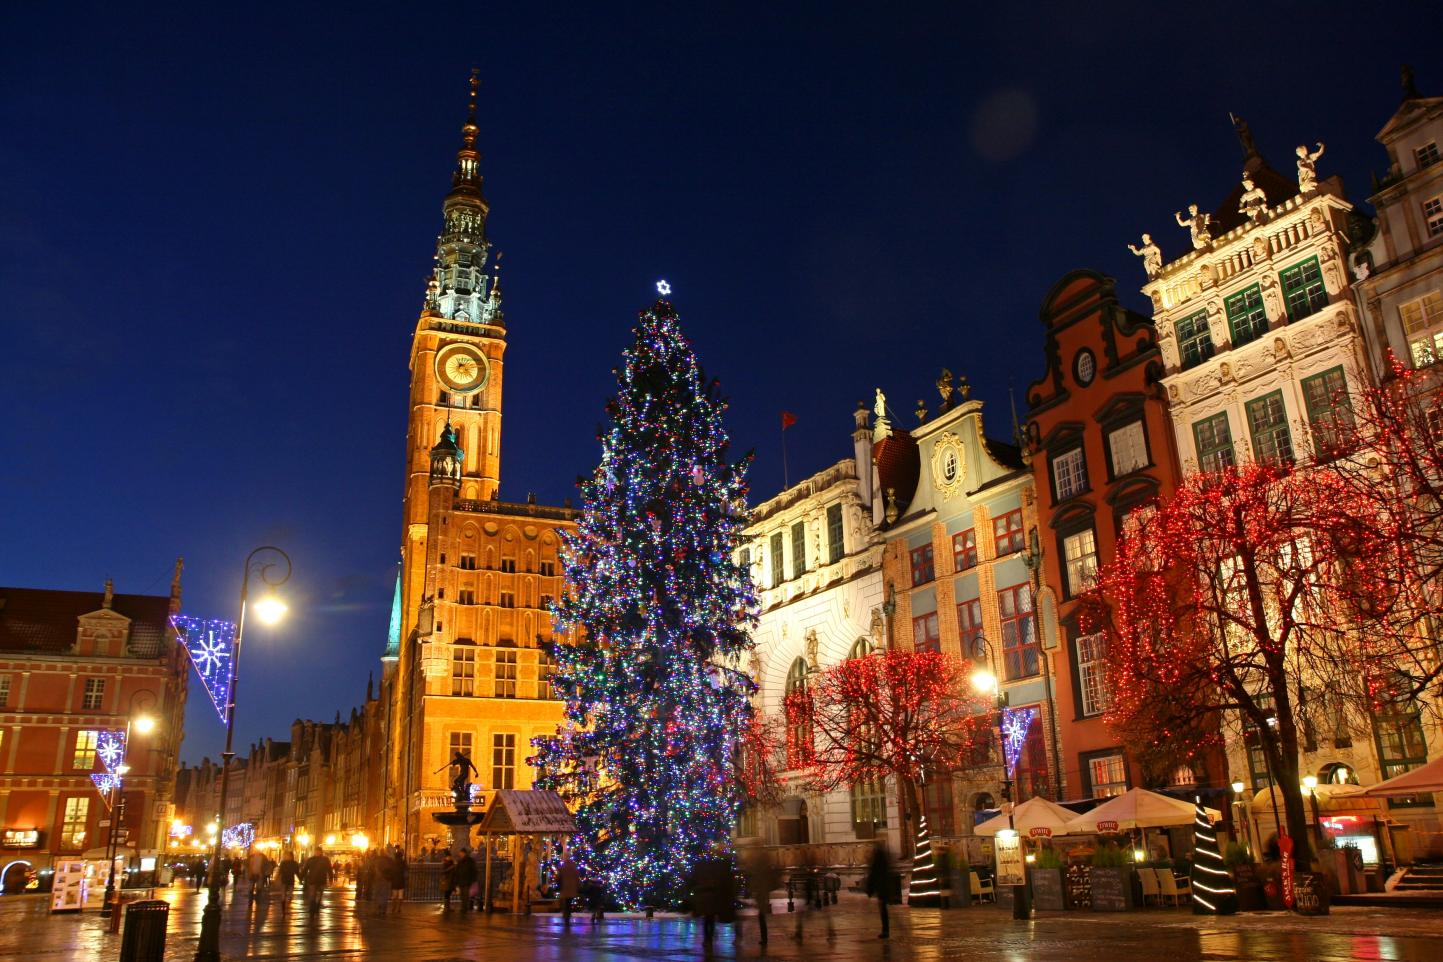 Weihnachtsmarkt in Danzig. Foto: Maciej Nicgorski/www.gdansk.pl